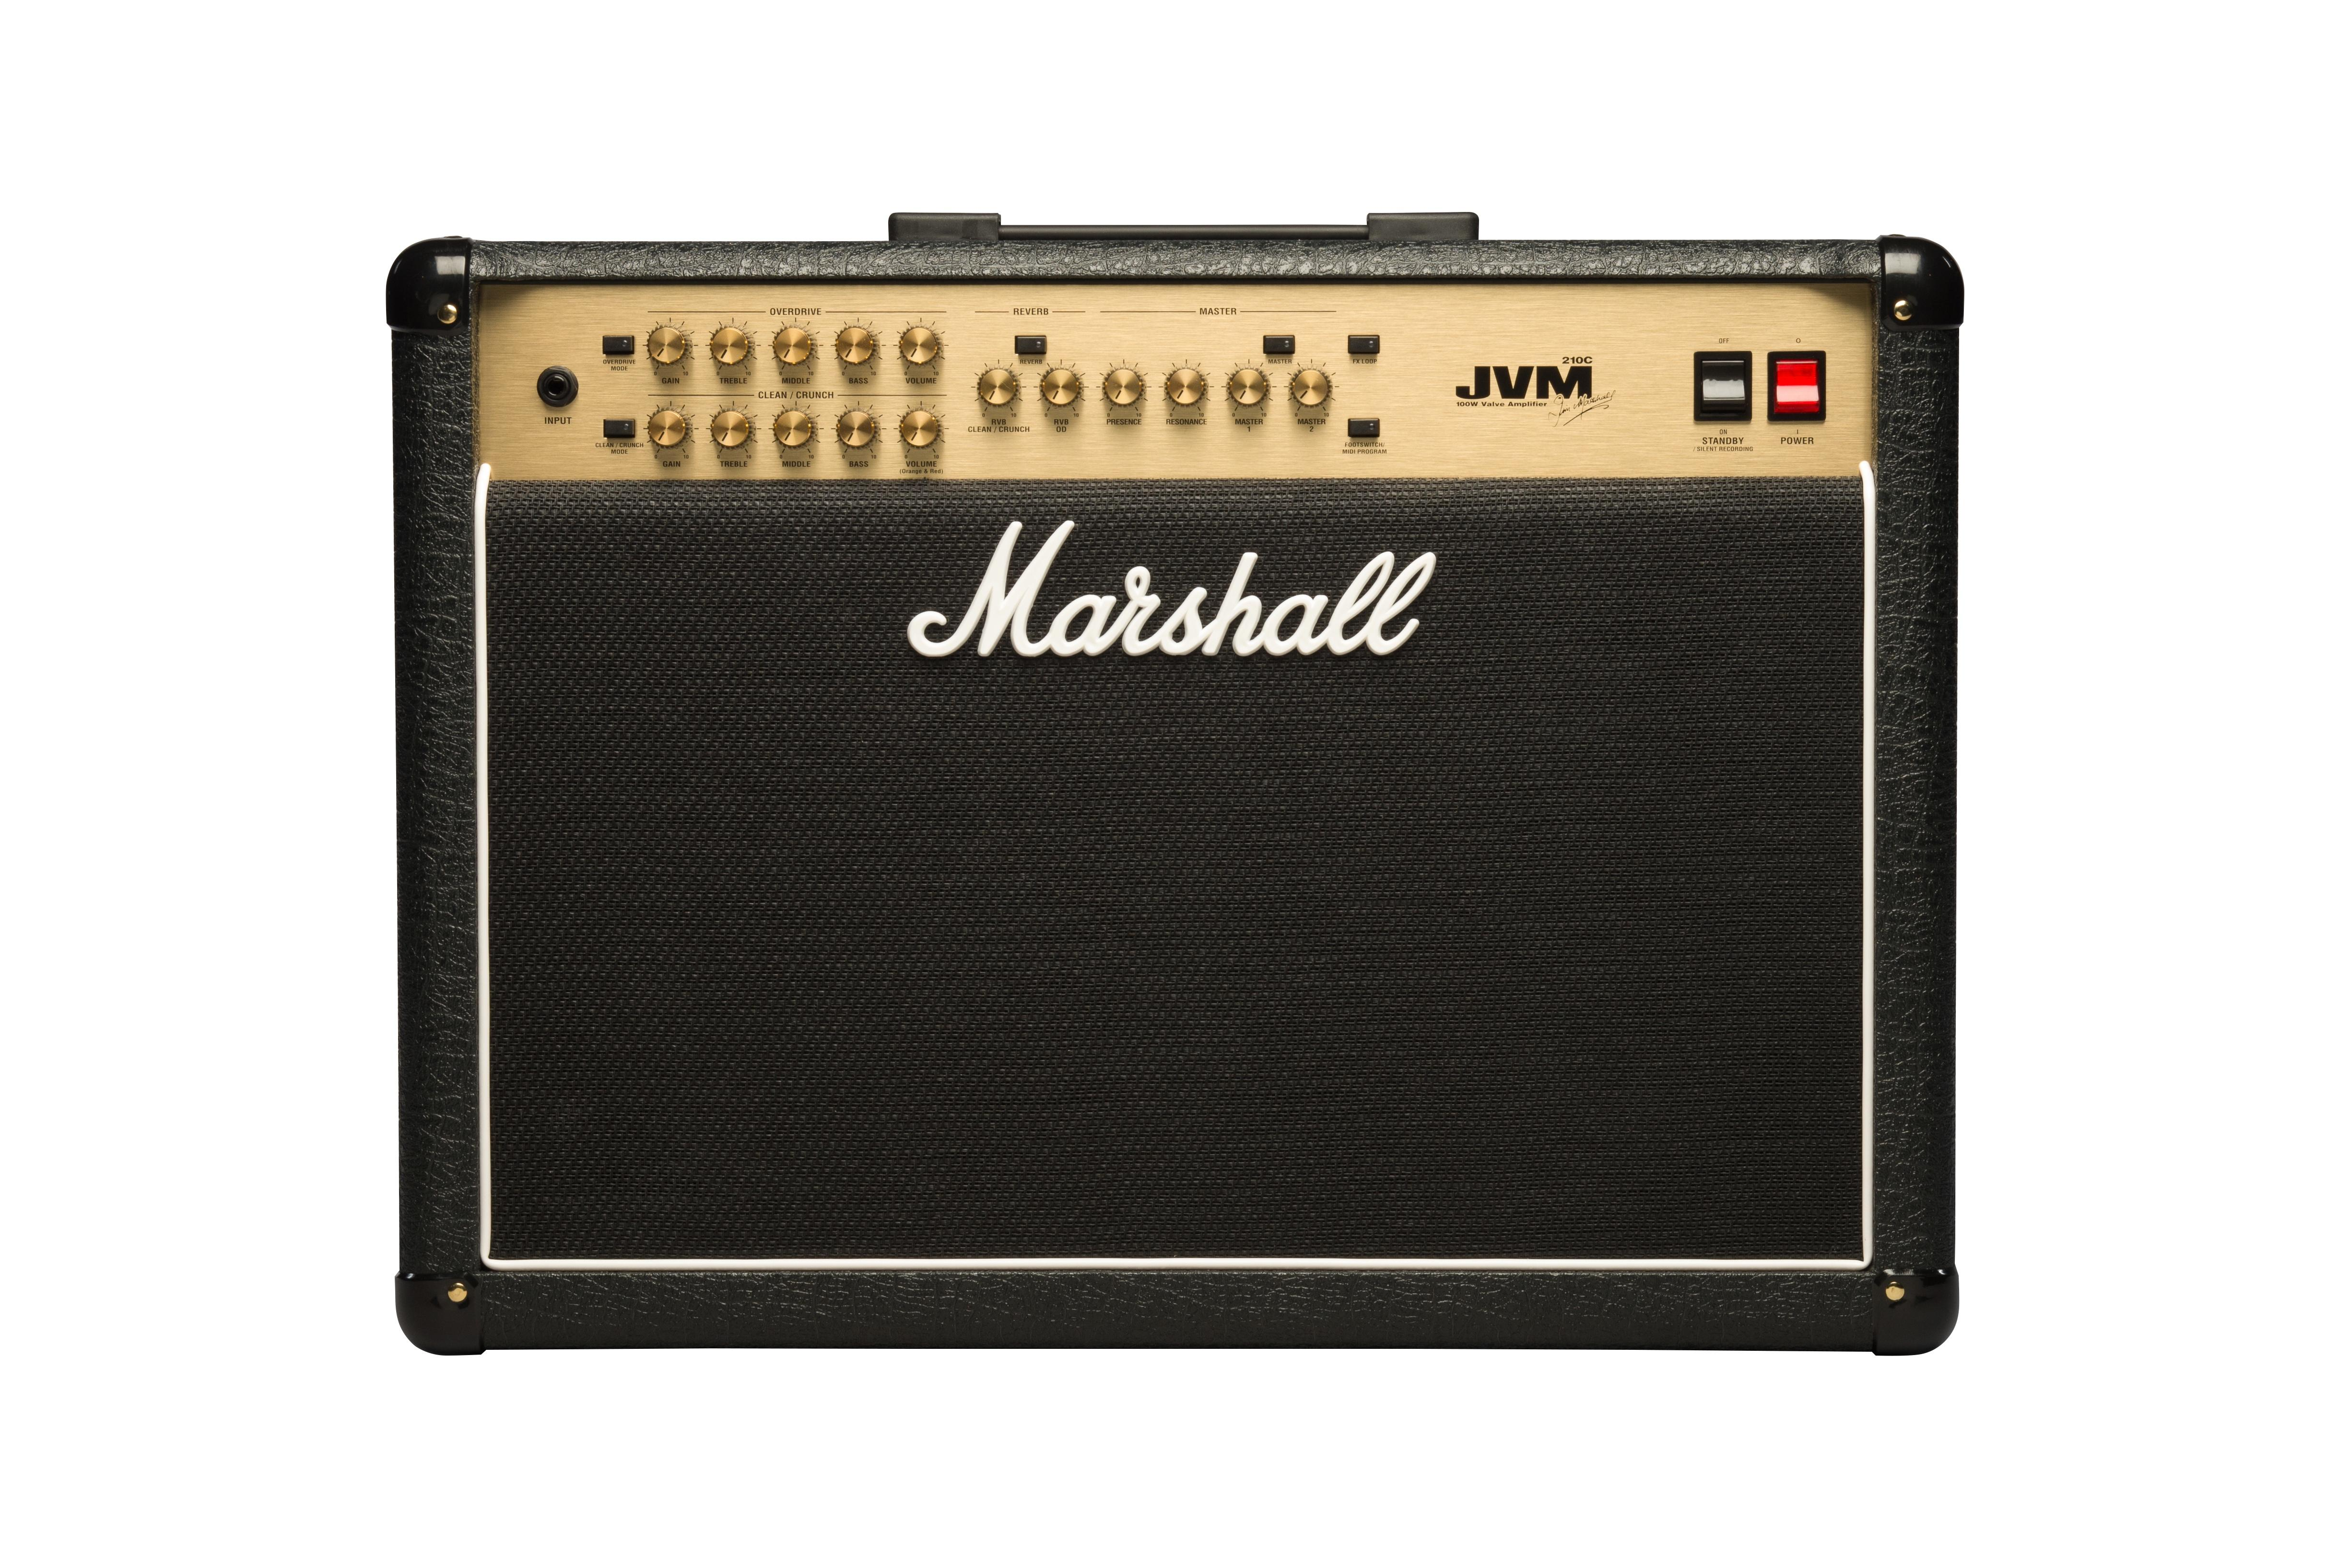 marshall jvm m jvm210c u combo guitar amplifier musical instruments. Black Bedroom Furniture Sets. Home Design Ideas